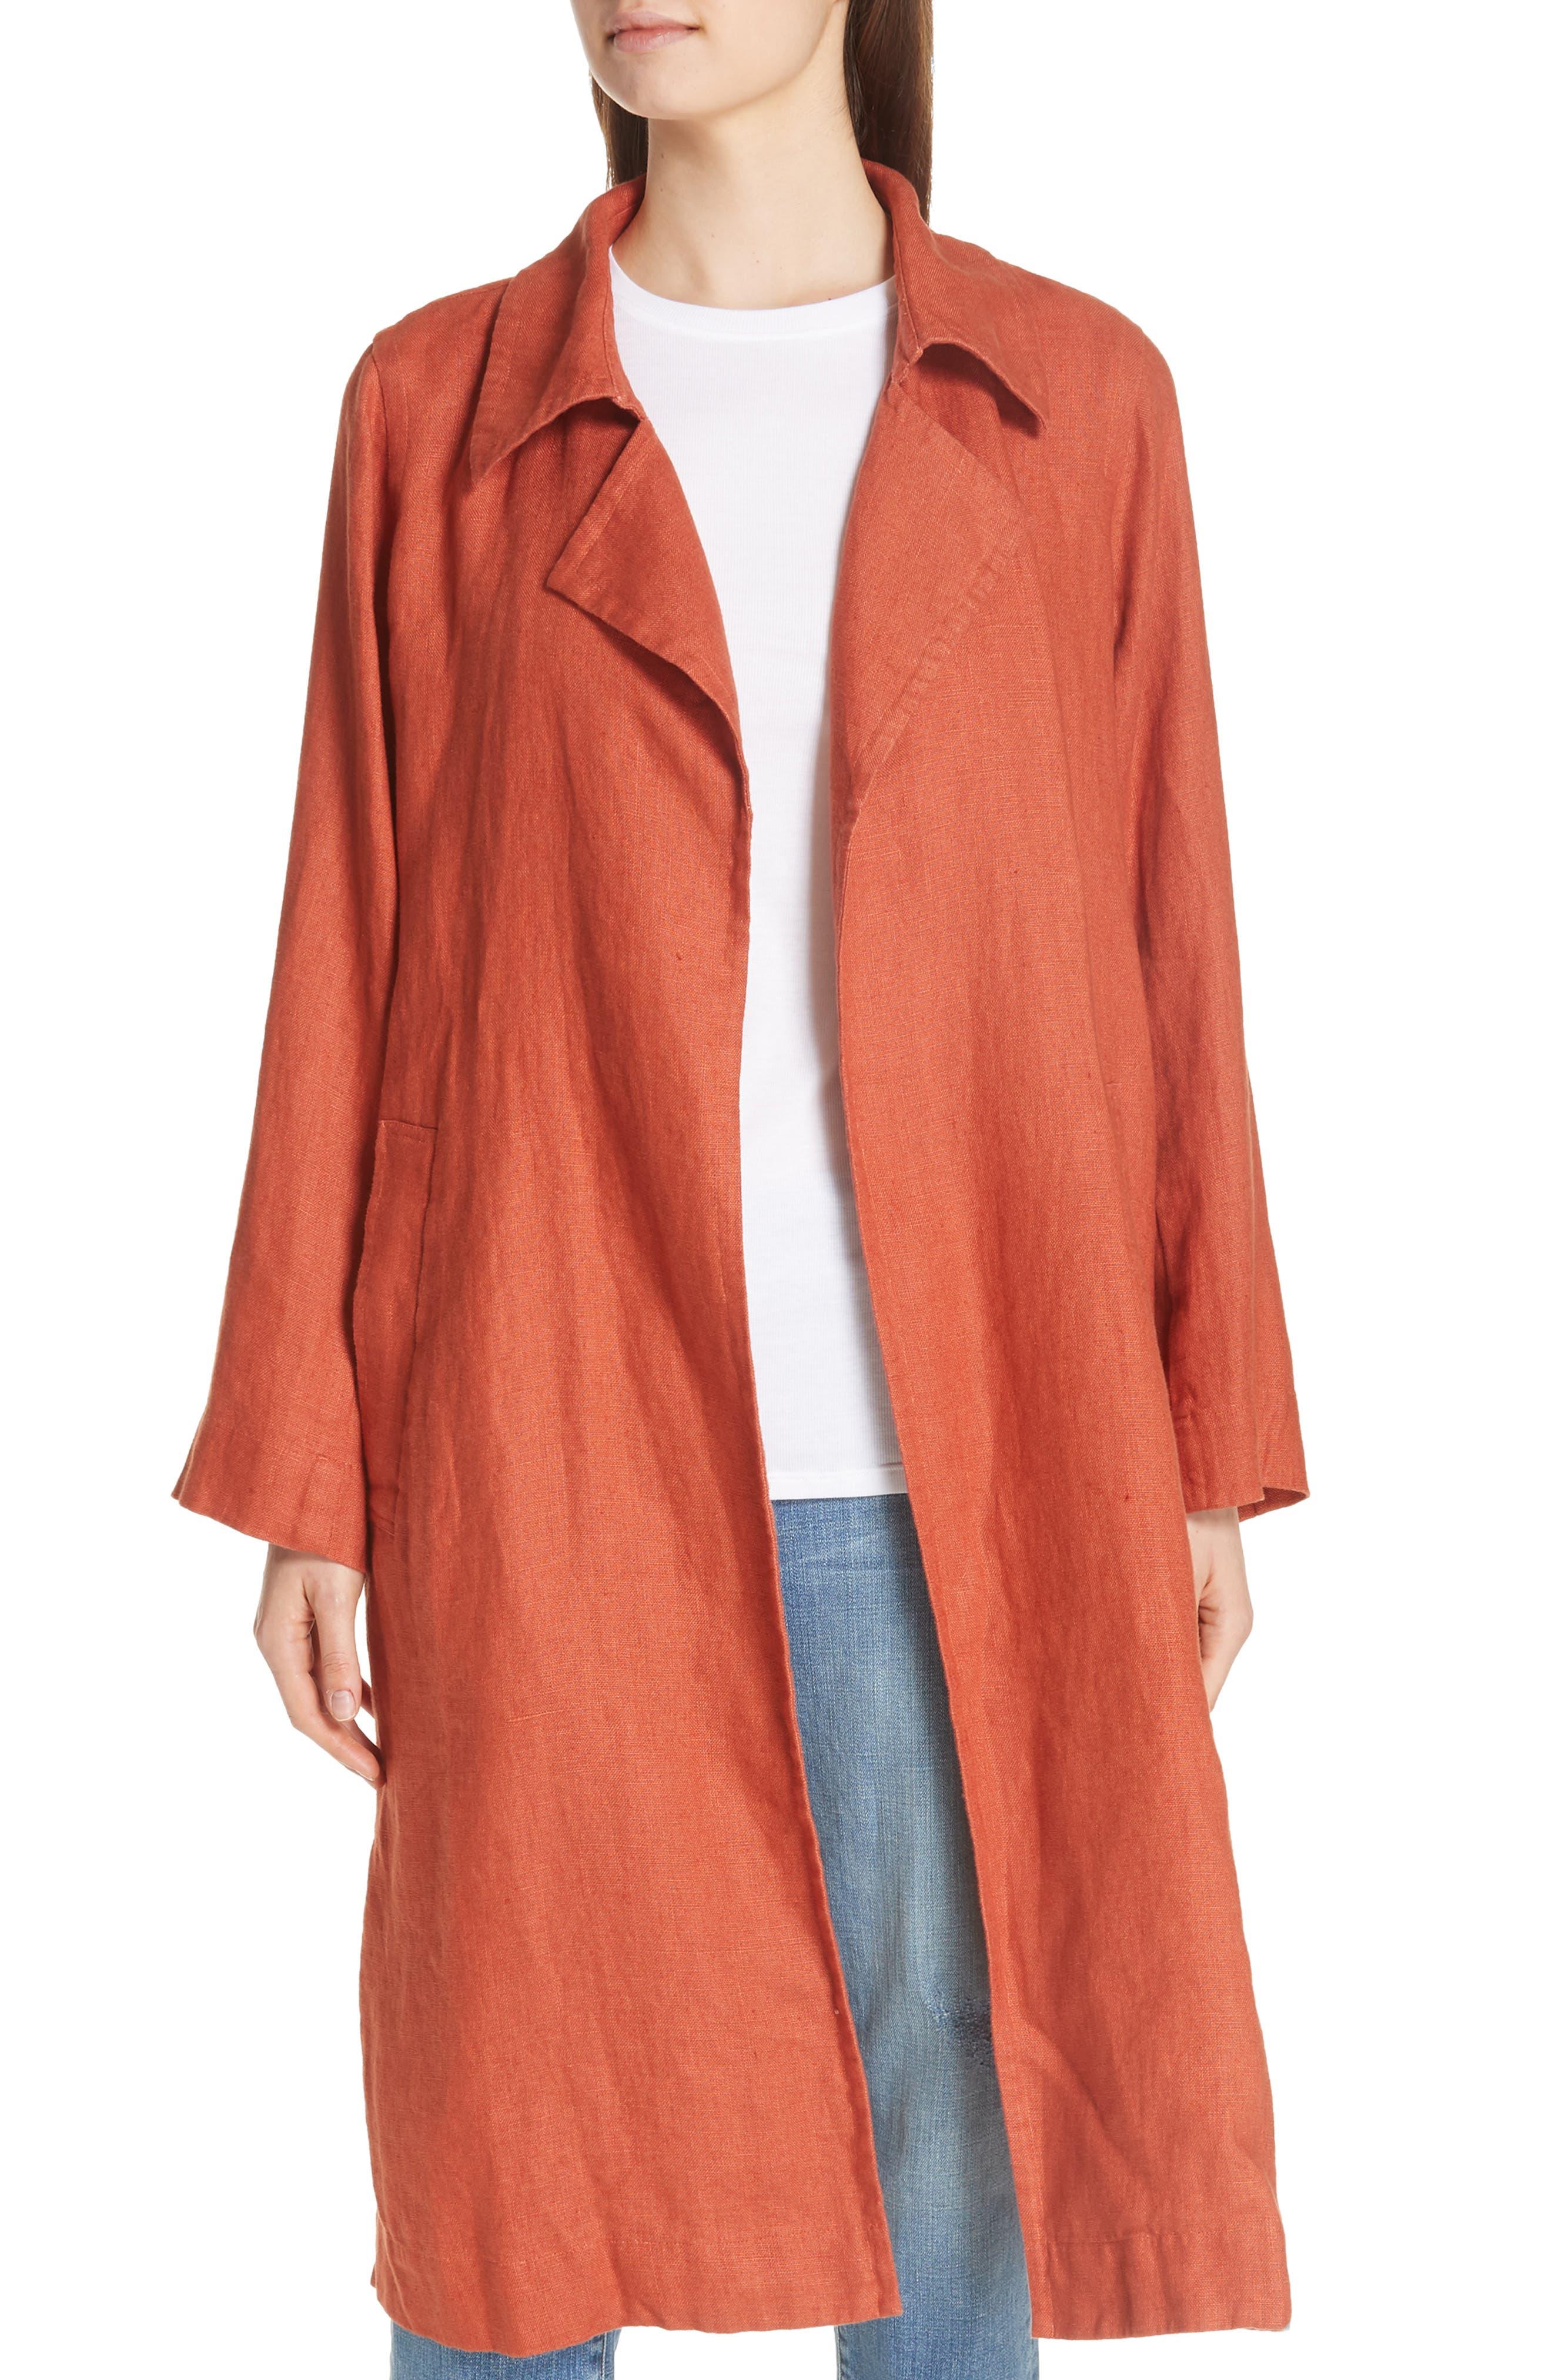 Organic Linen Trench Coat,                             Main thumbnail 1, color,                             822